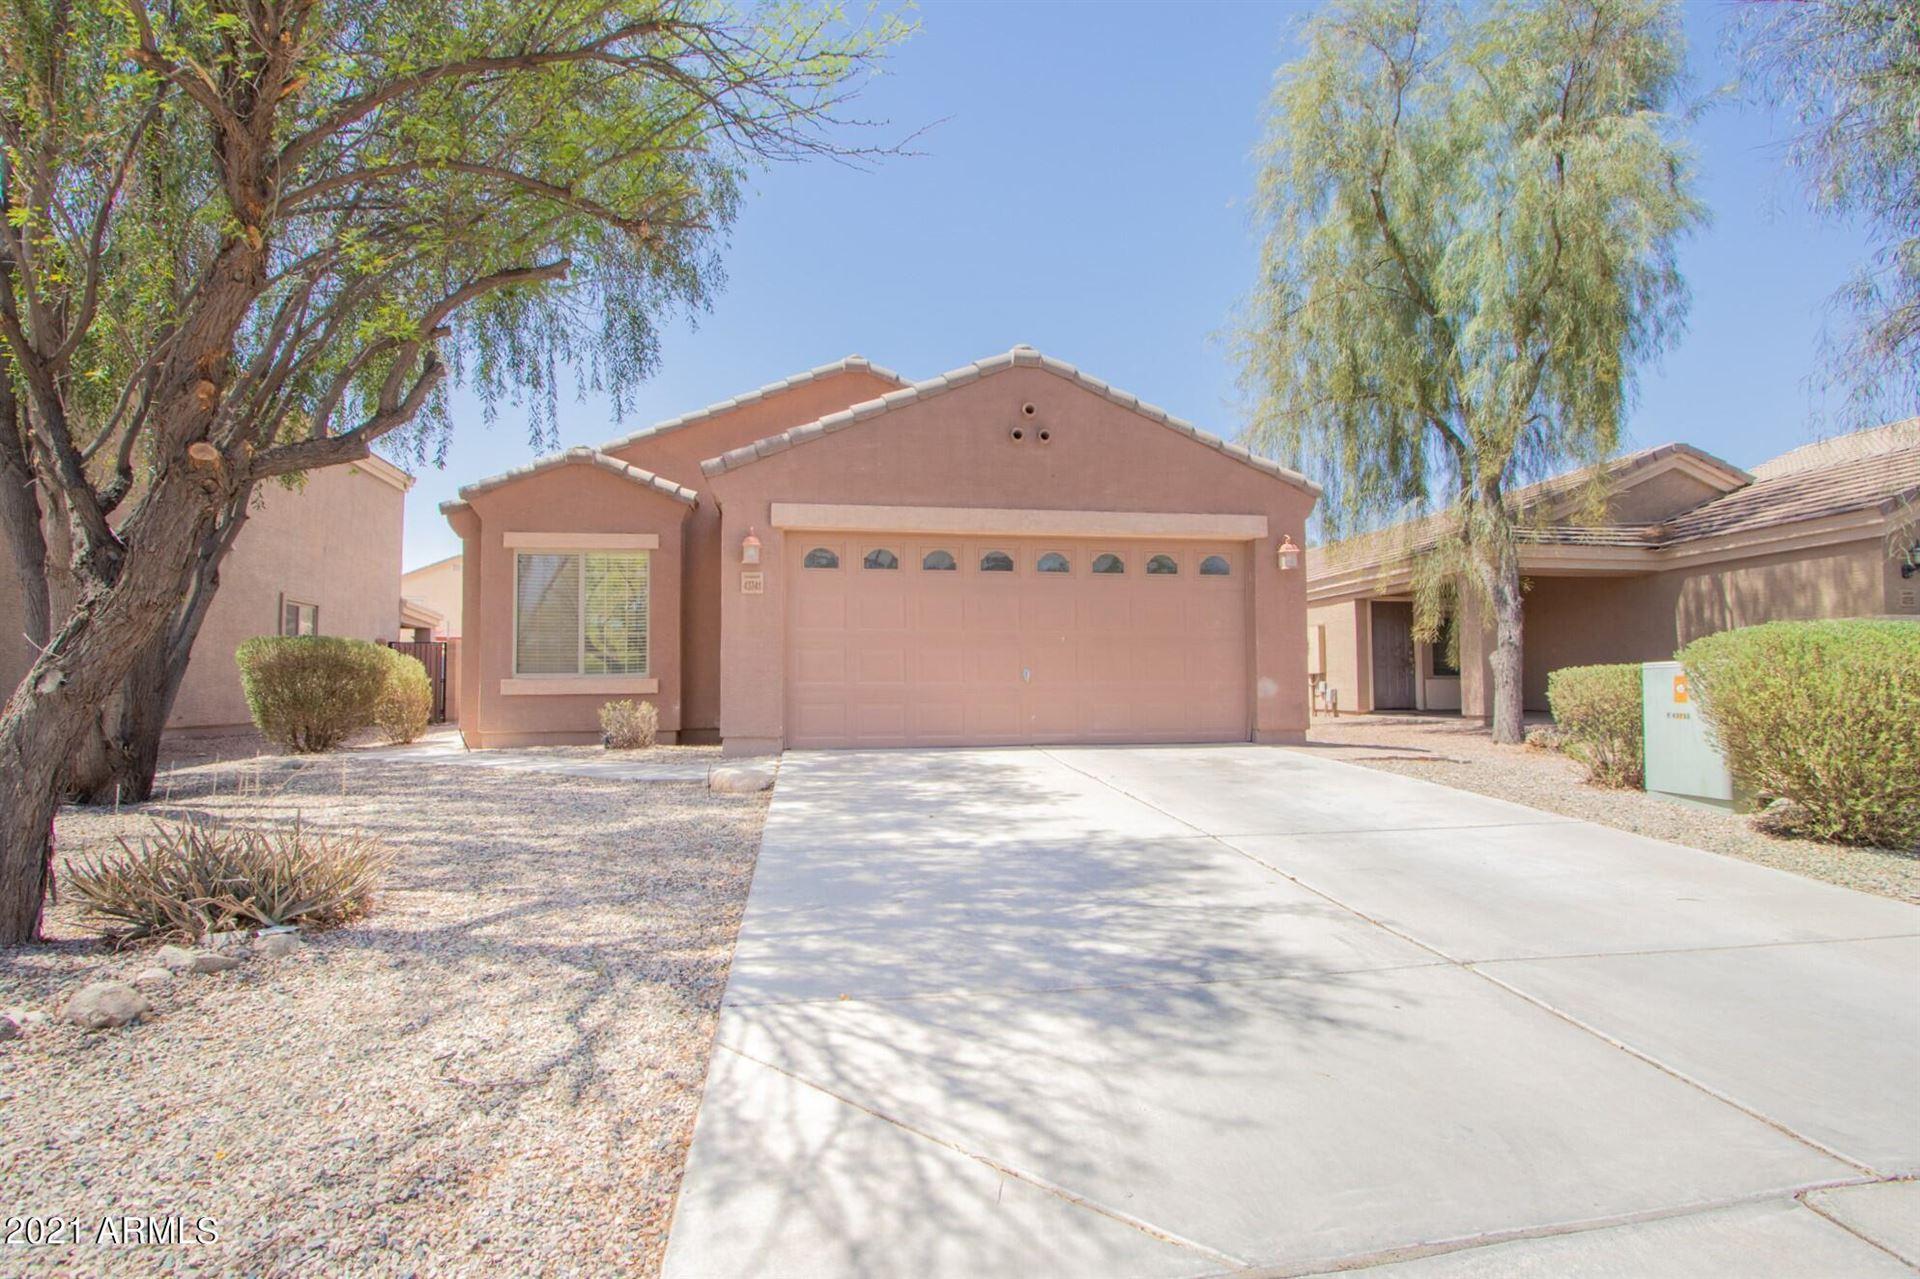 Photo for 43741 W WILD HORSE Trail, Maricopa, AZ 85138 (MLS # 6234839)